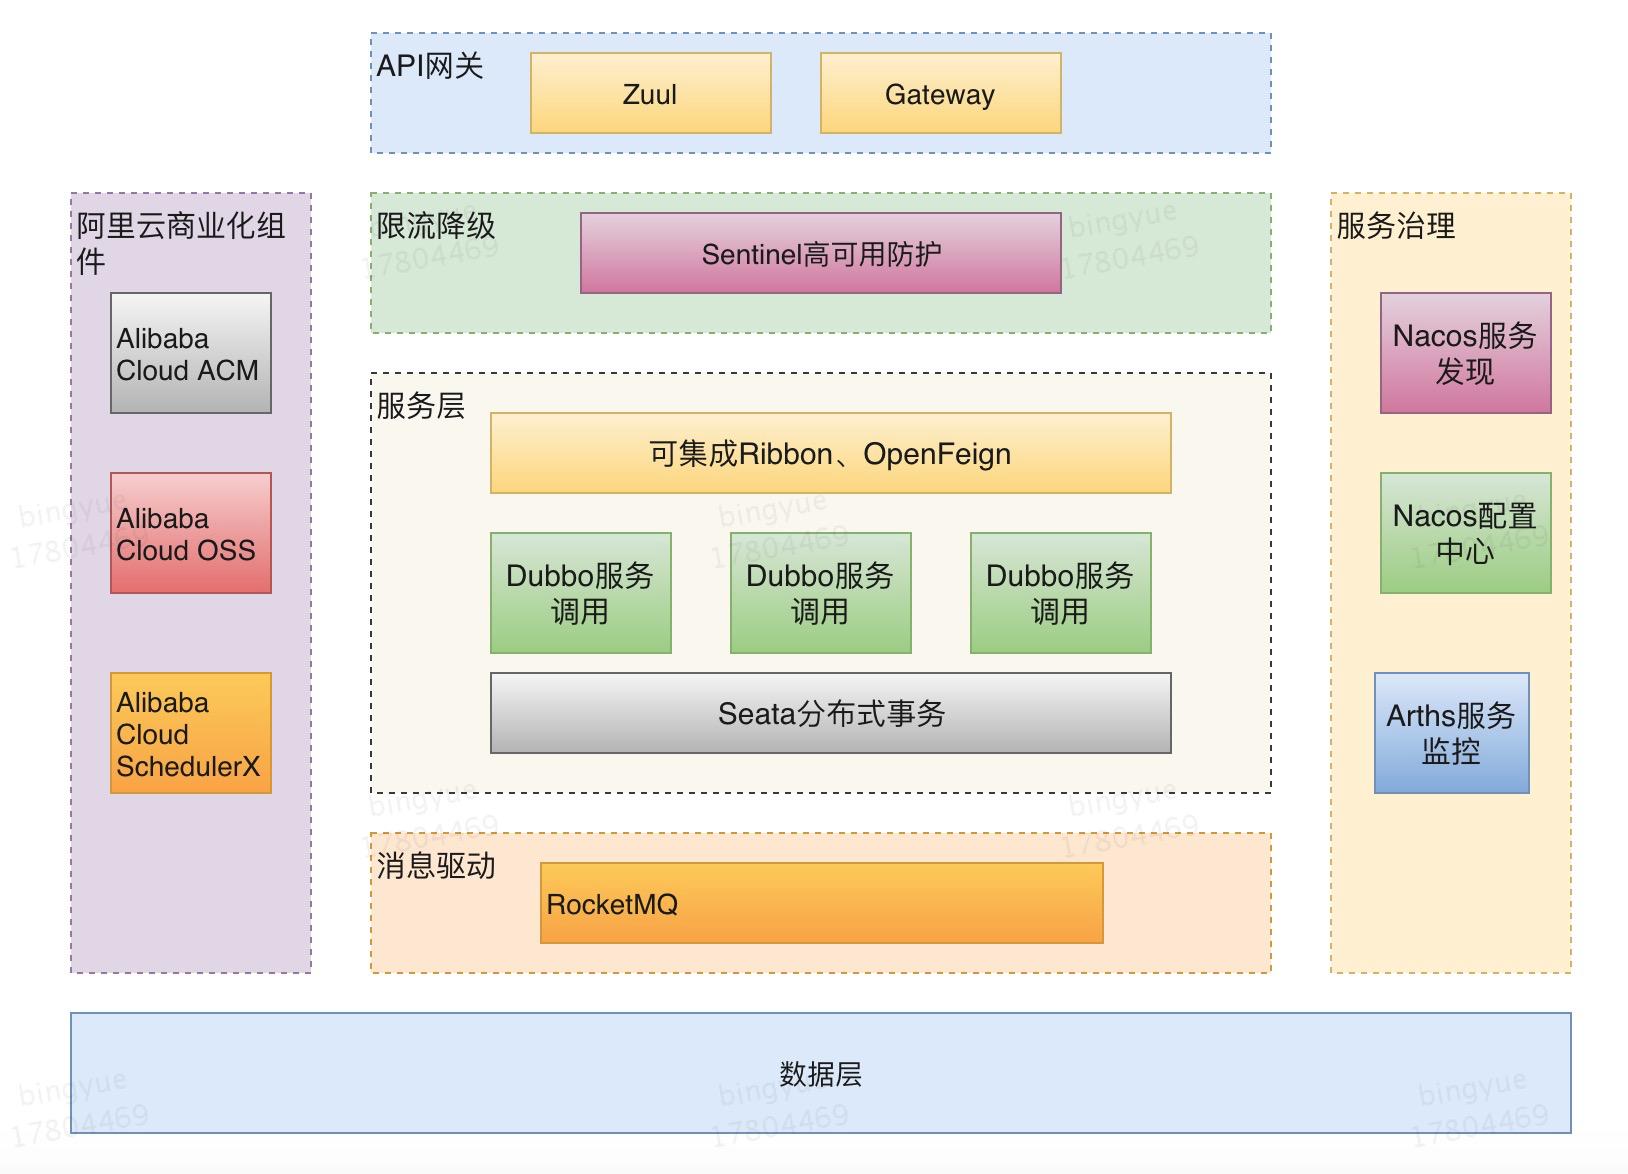 Spring Cloud Alibaba 新一代微服务解决方案